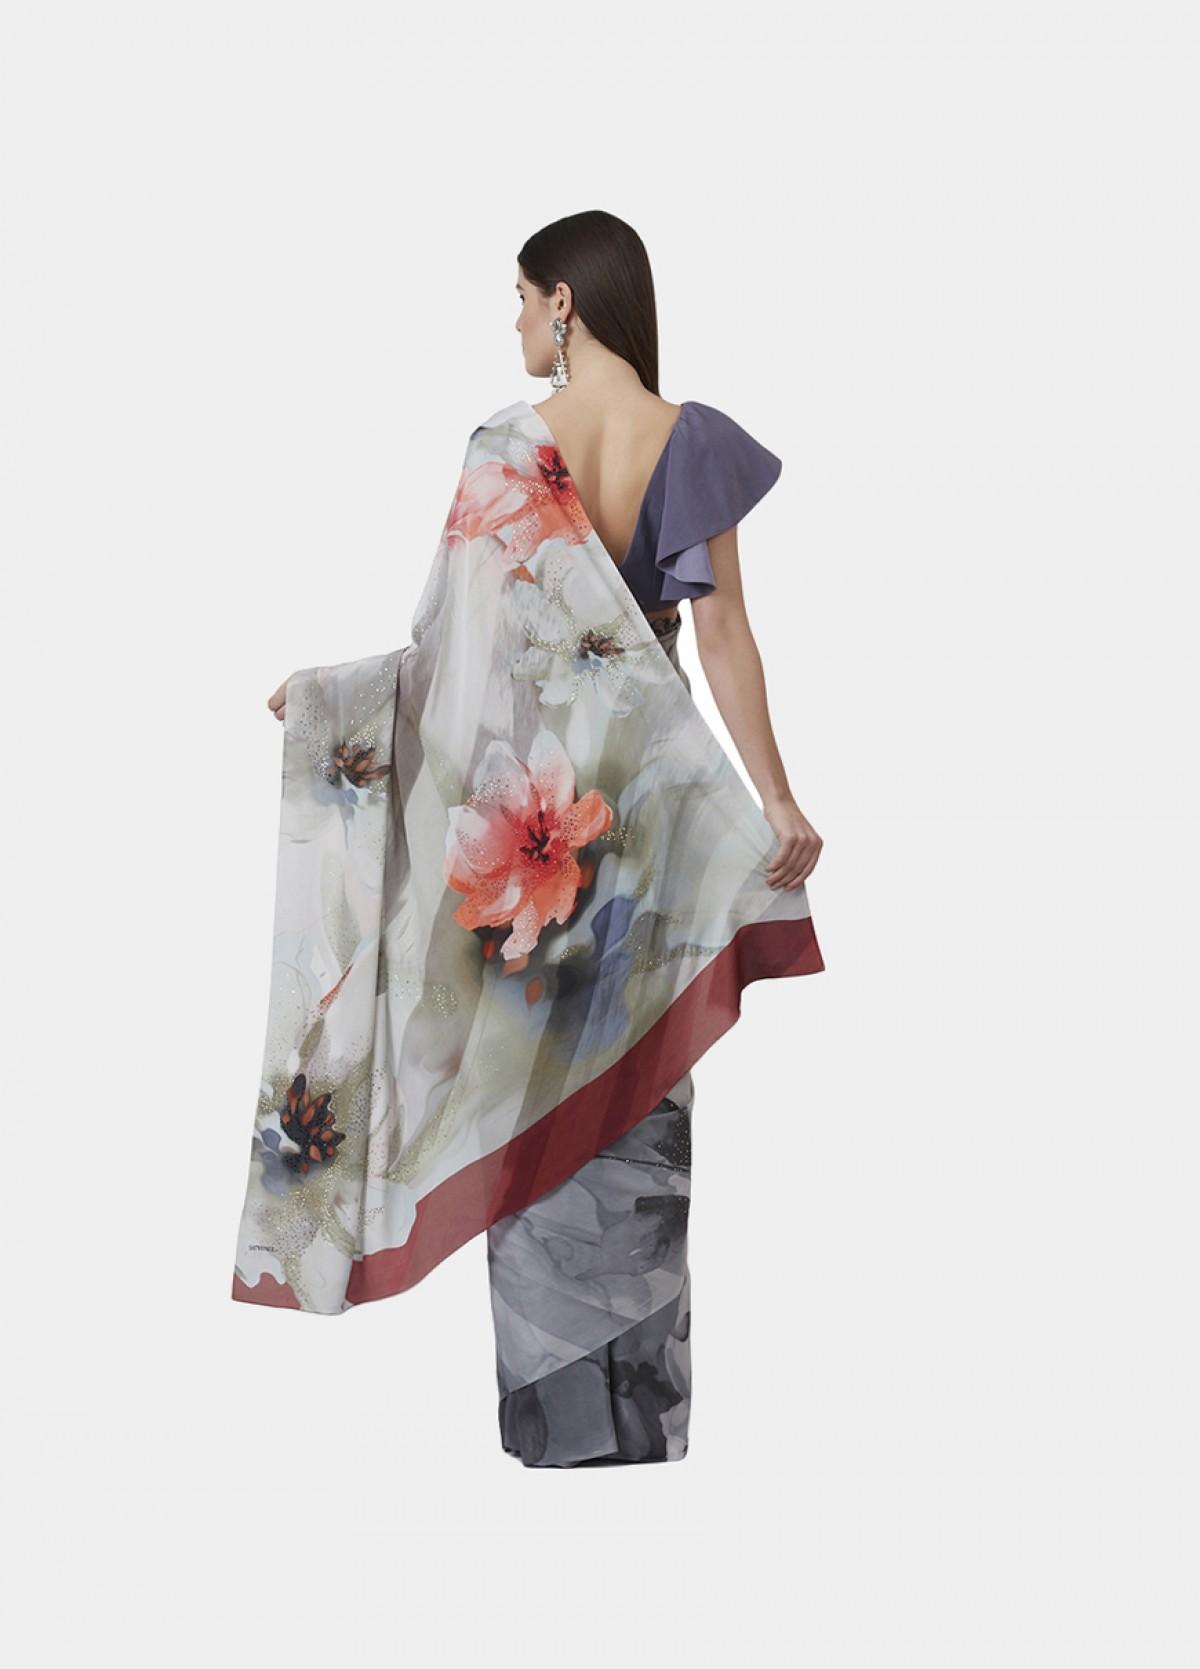 The Wild Flowers Sari